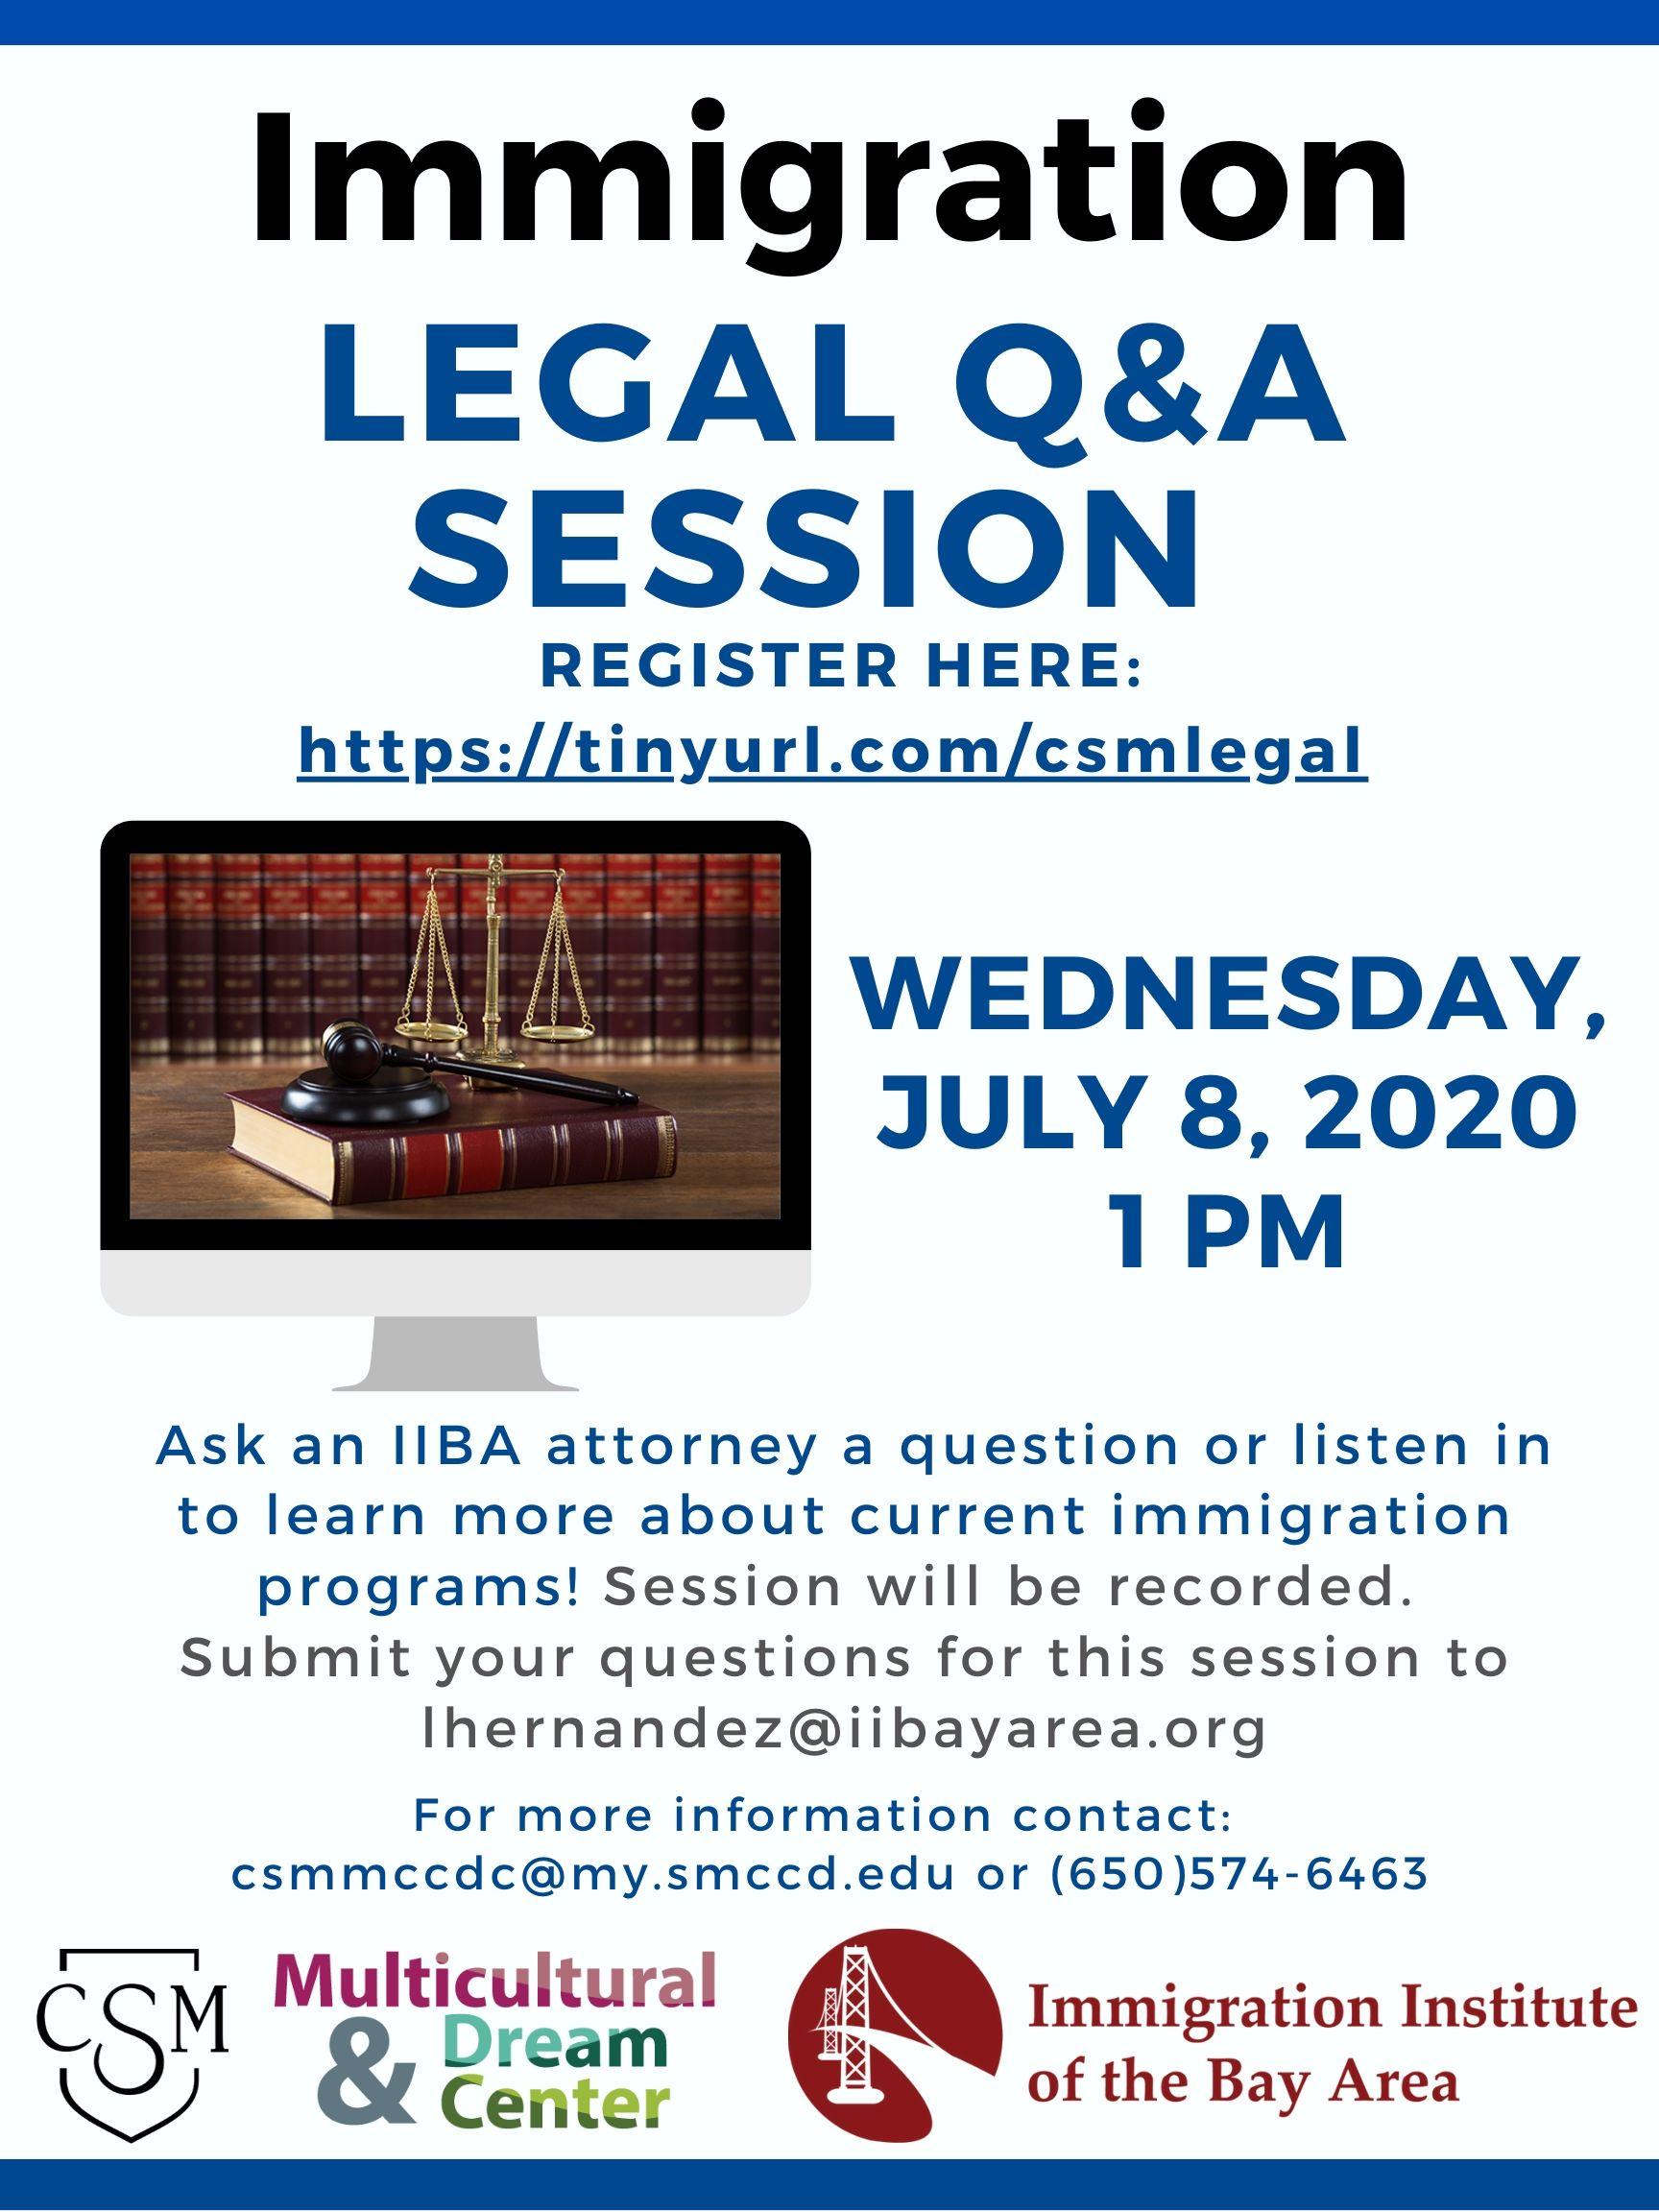 Legal Q&A Session